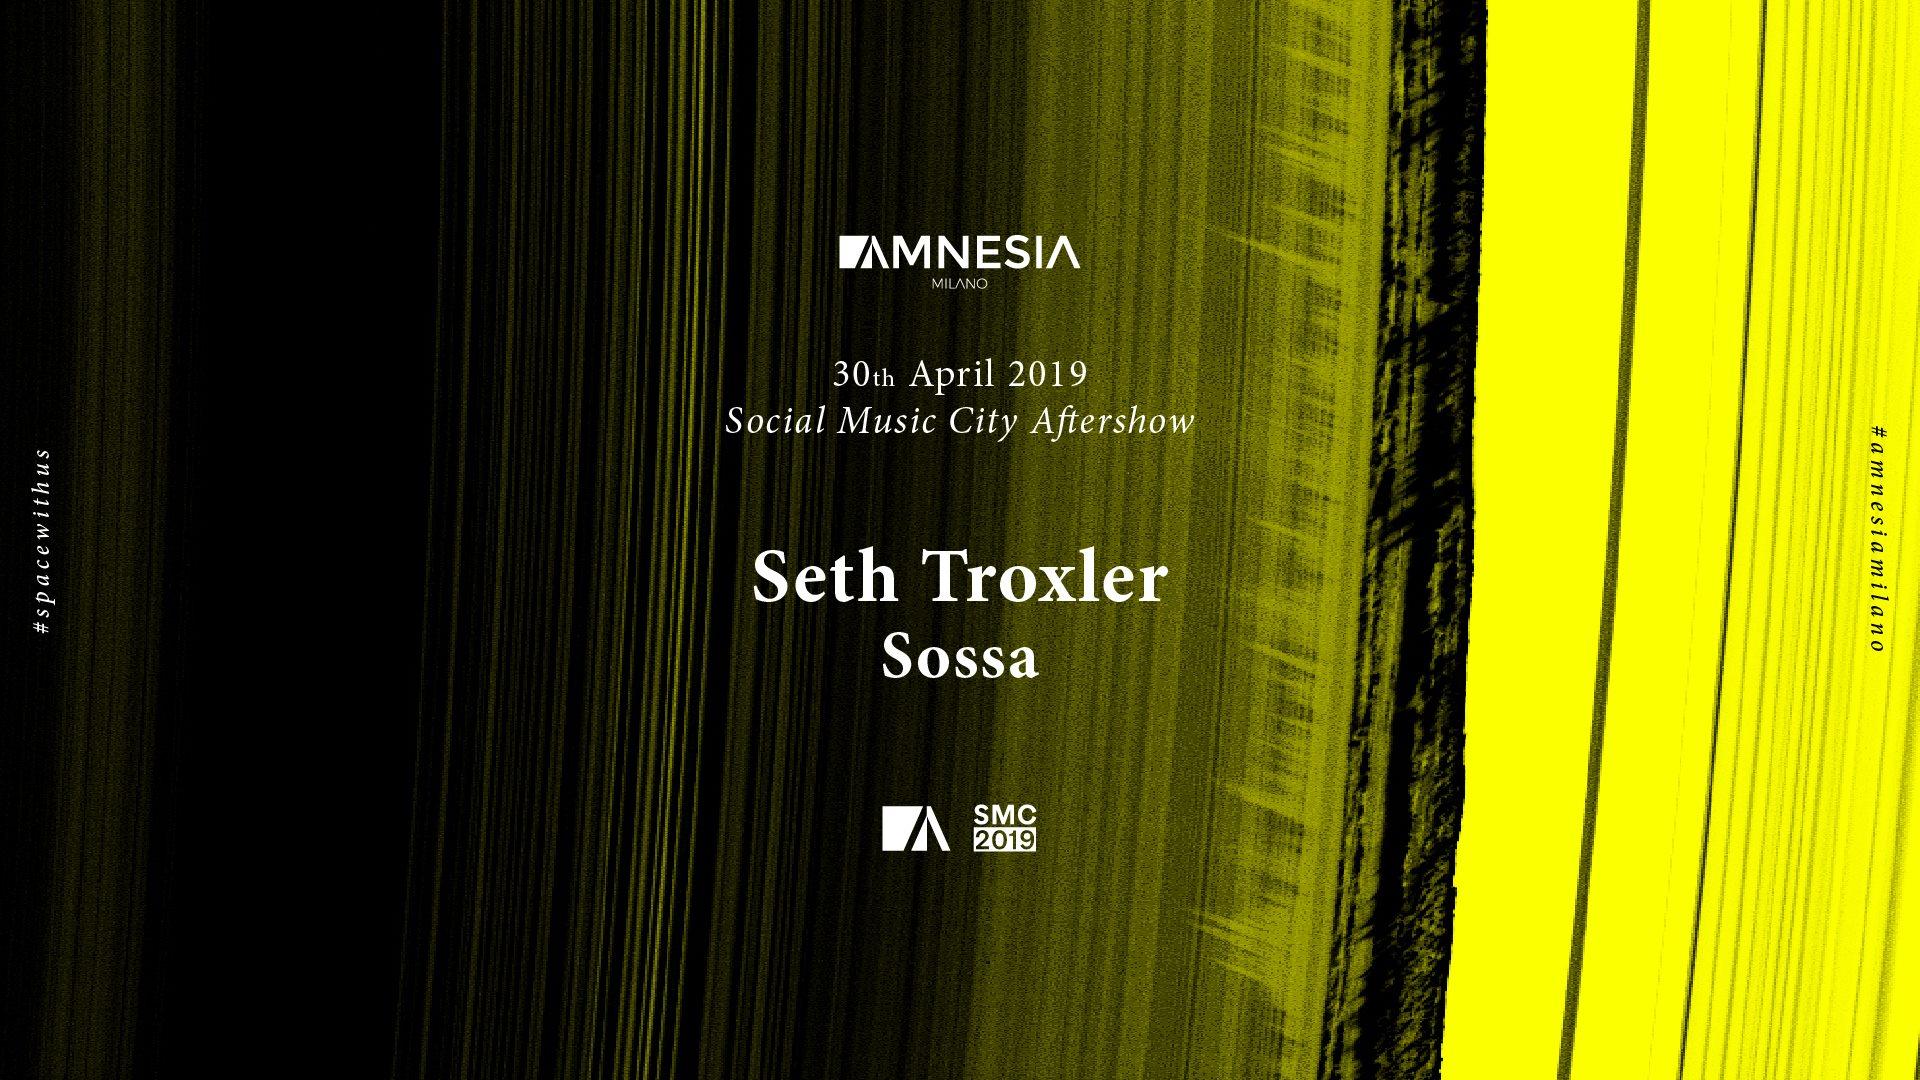 Amnesia Seth Troxler Aftershow Social Music City 30 Aprile 2019